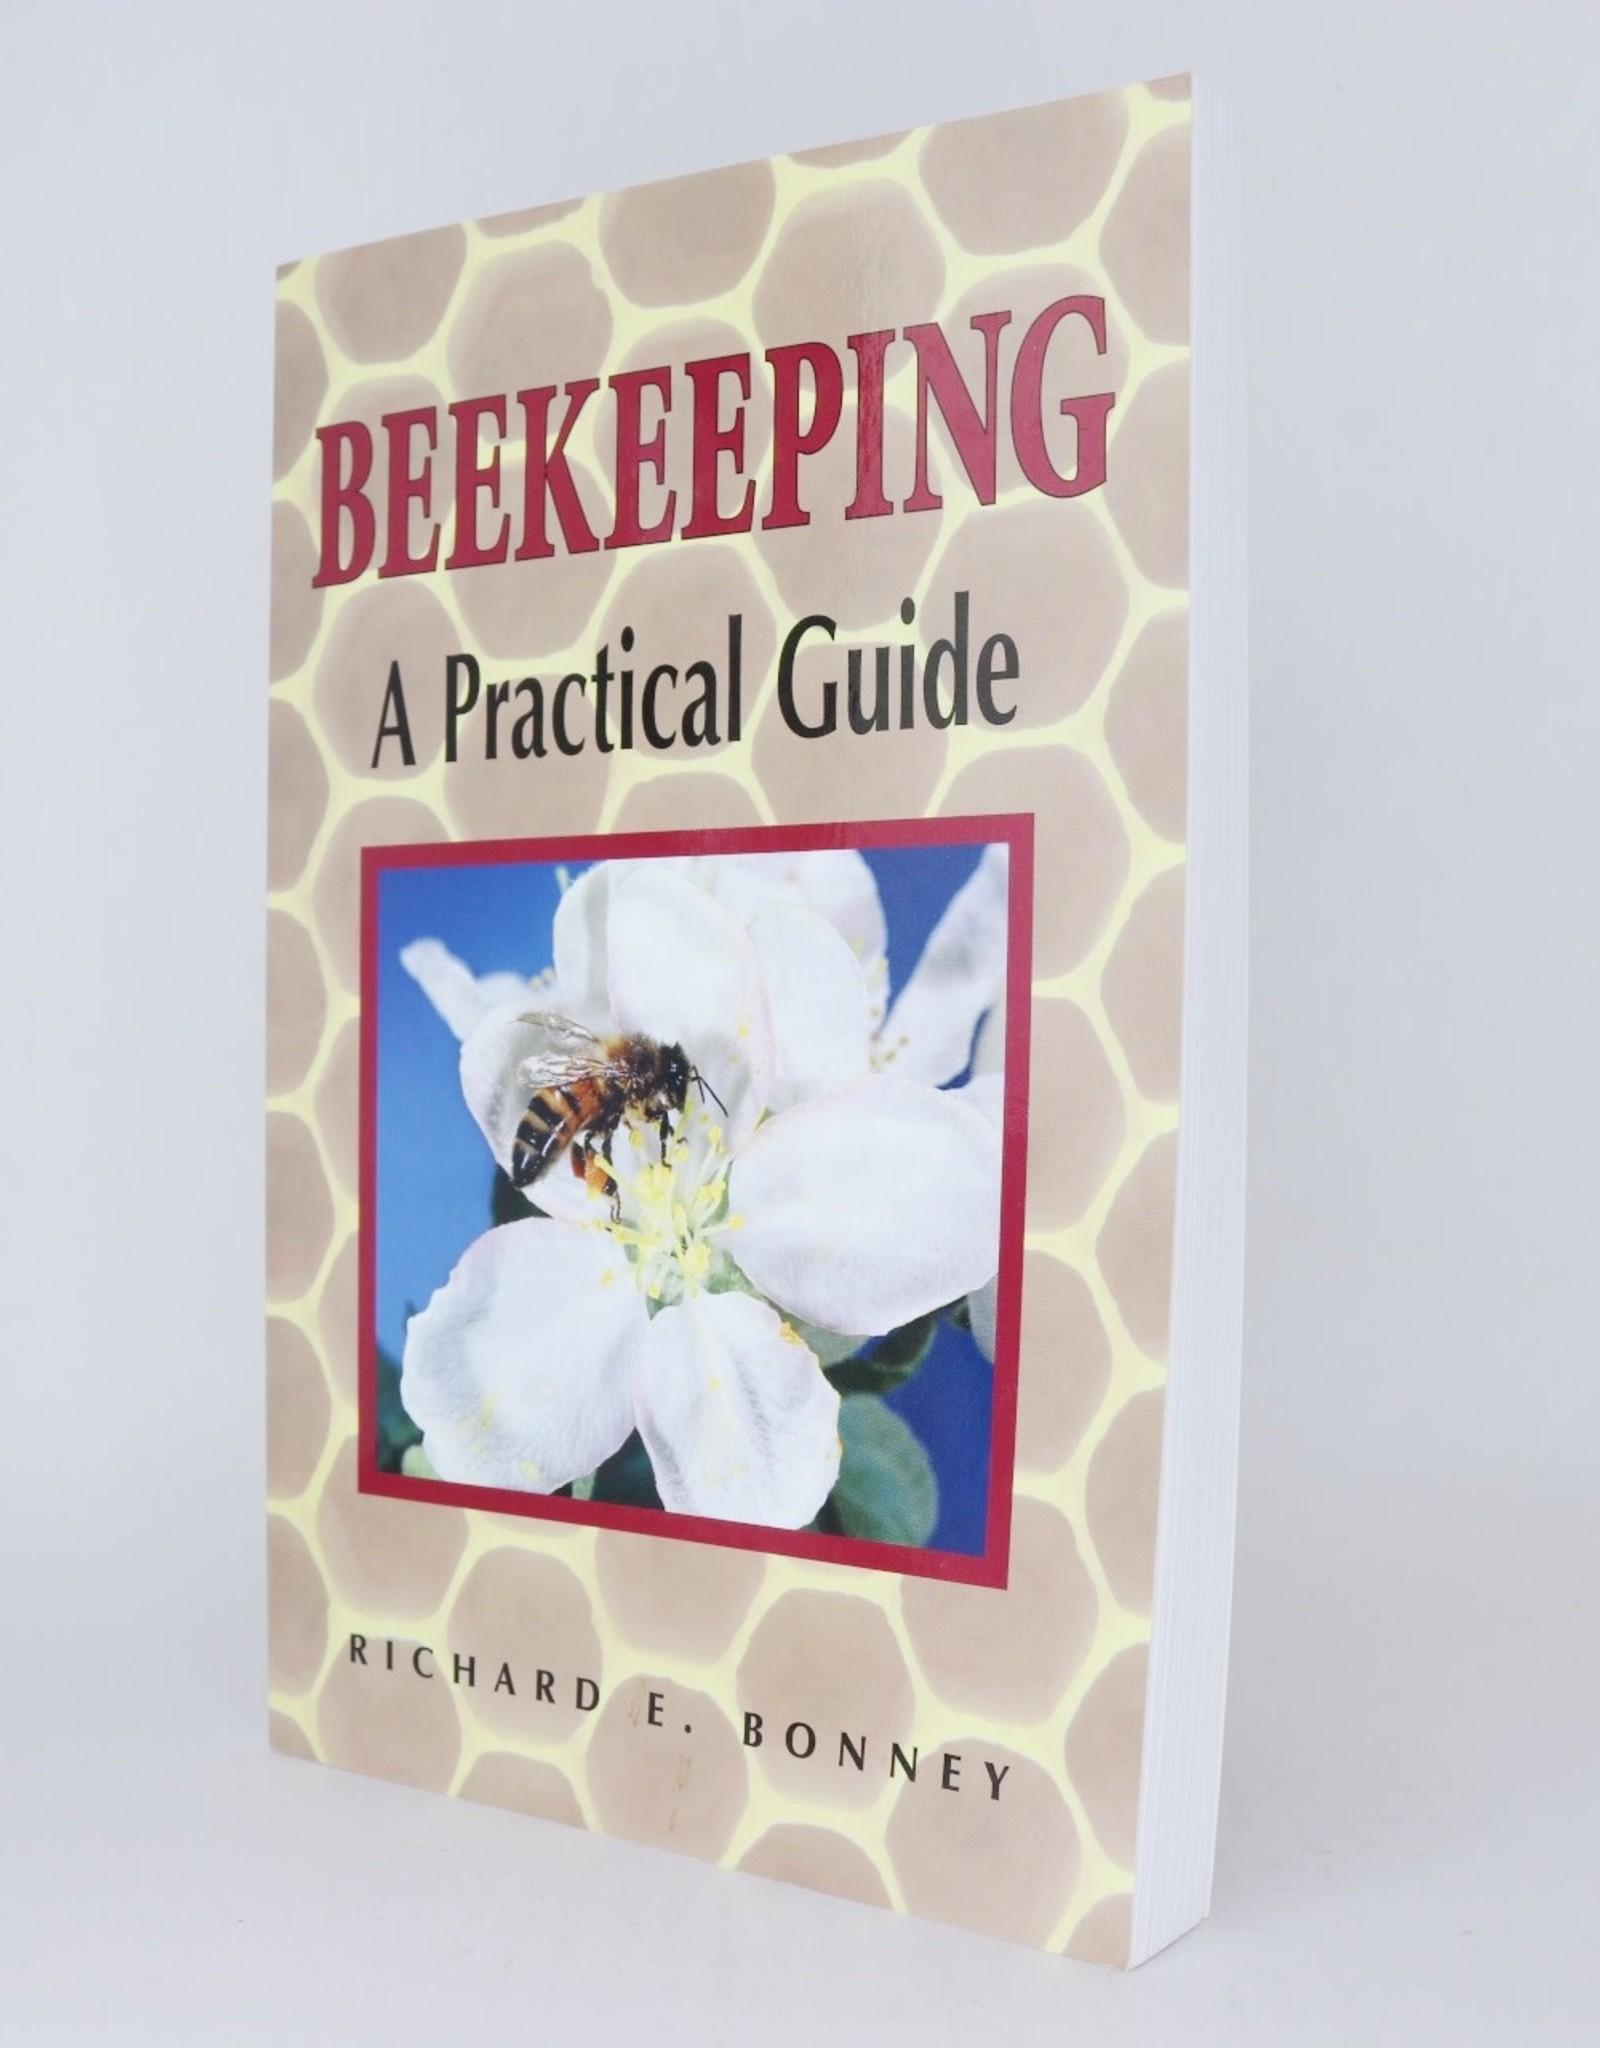 Beekeeping; A Practical Guide